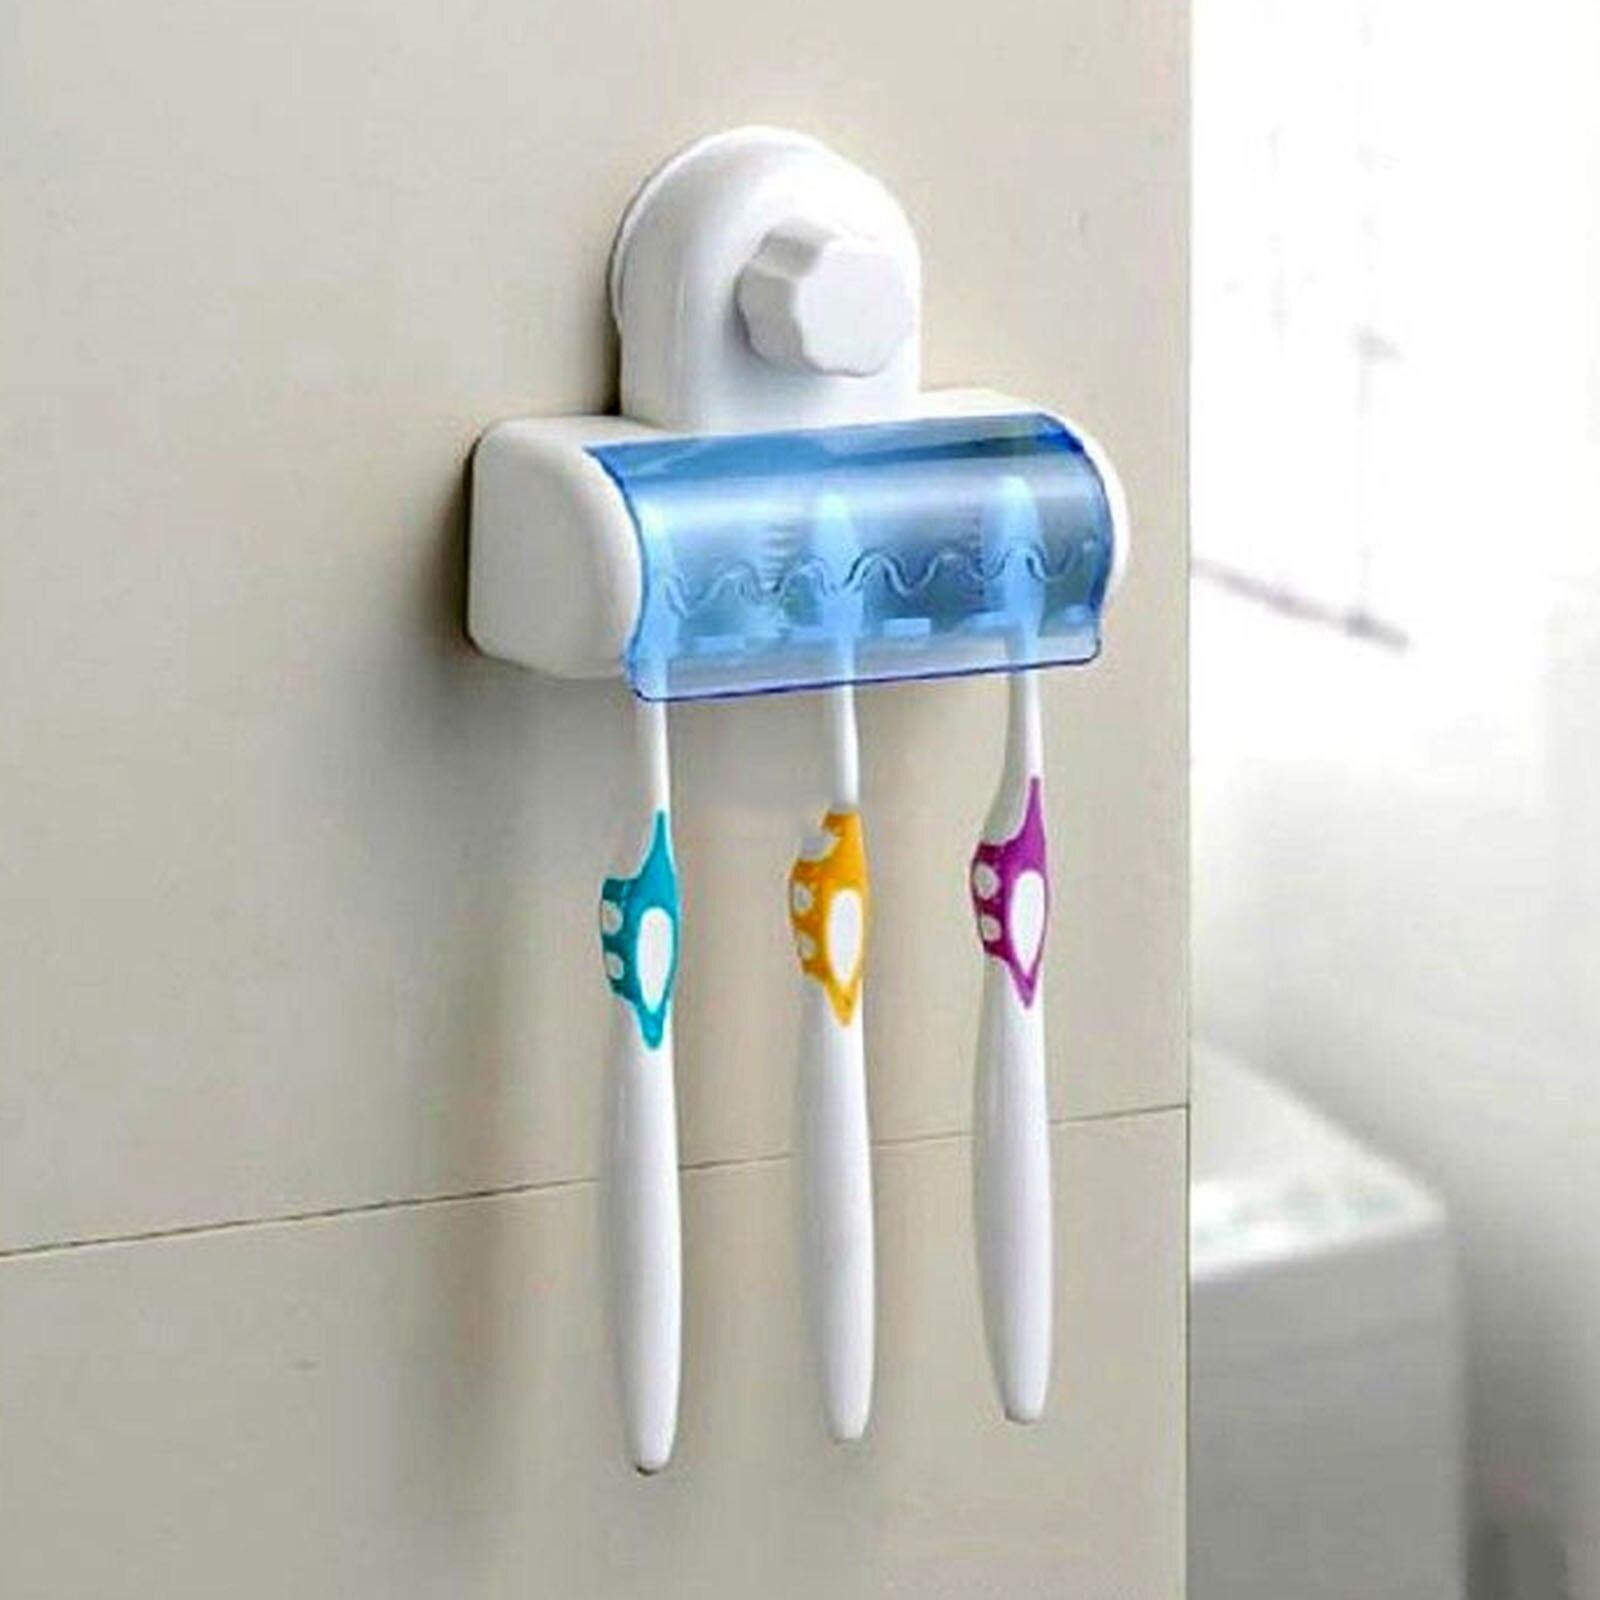 Multifunctional Bathroom Suction Cup Toothbrush SpinBrush Hanging Holder Stand Lidded 5 Racks toothbrush